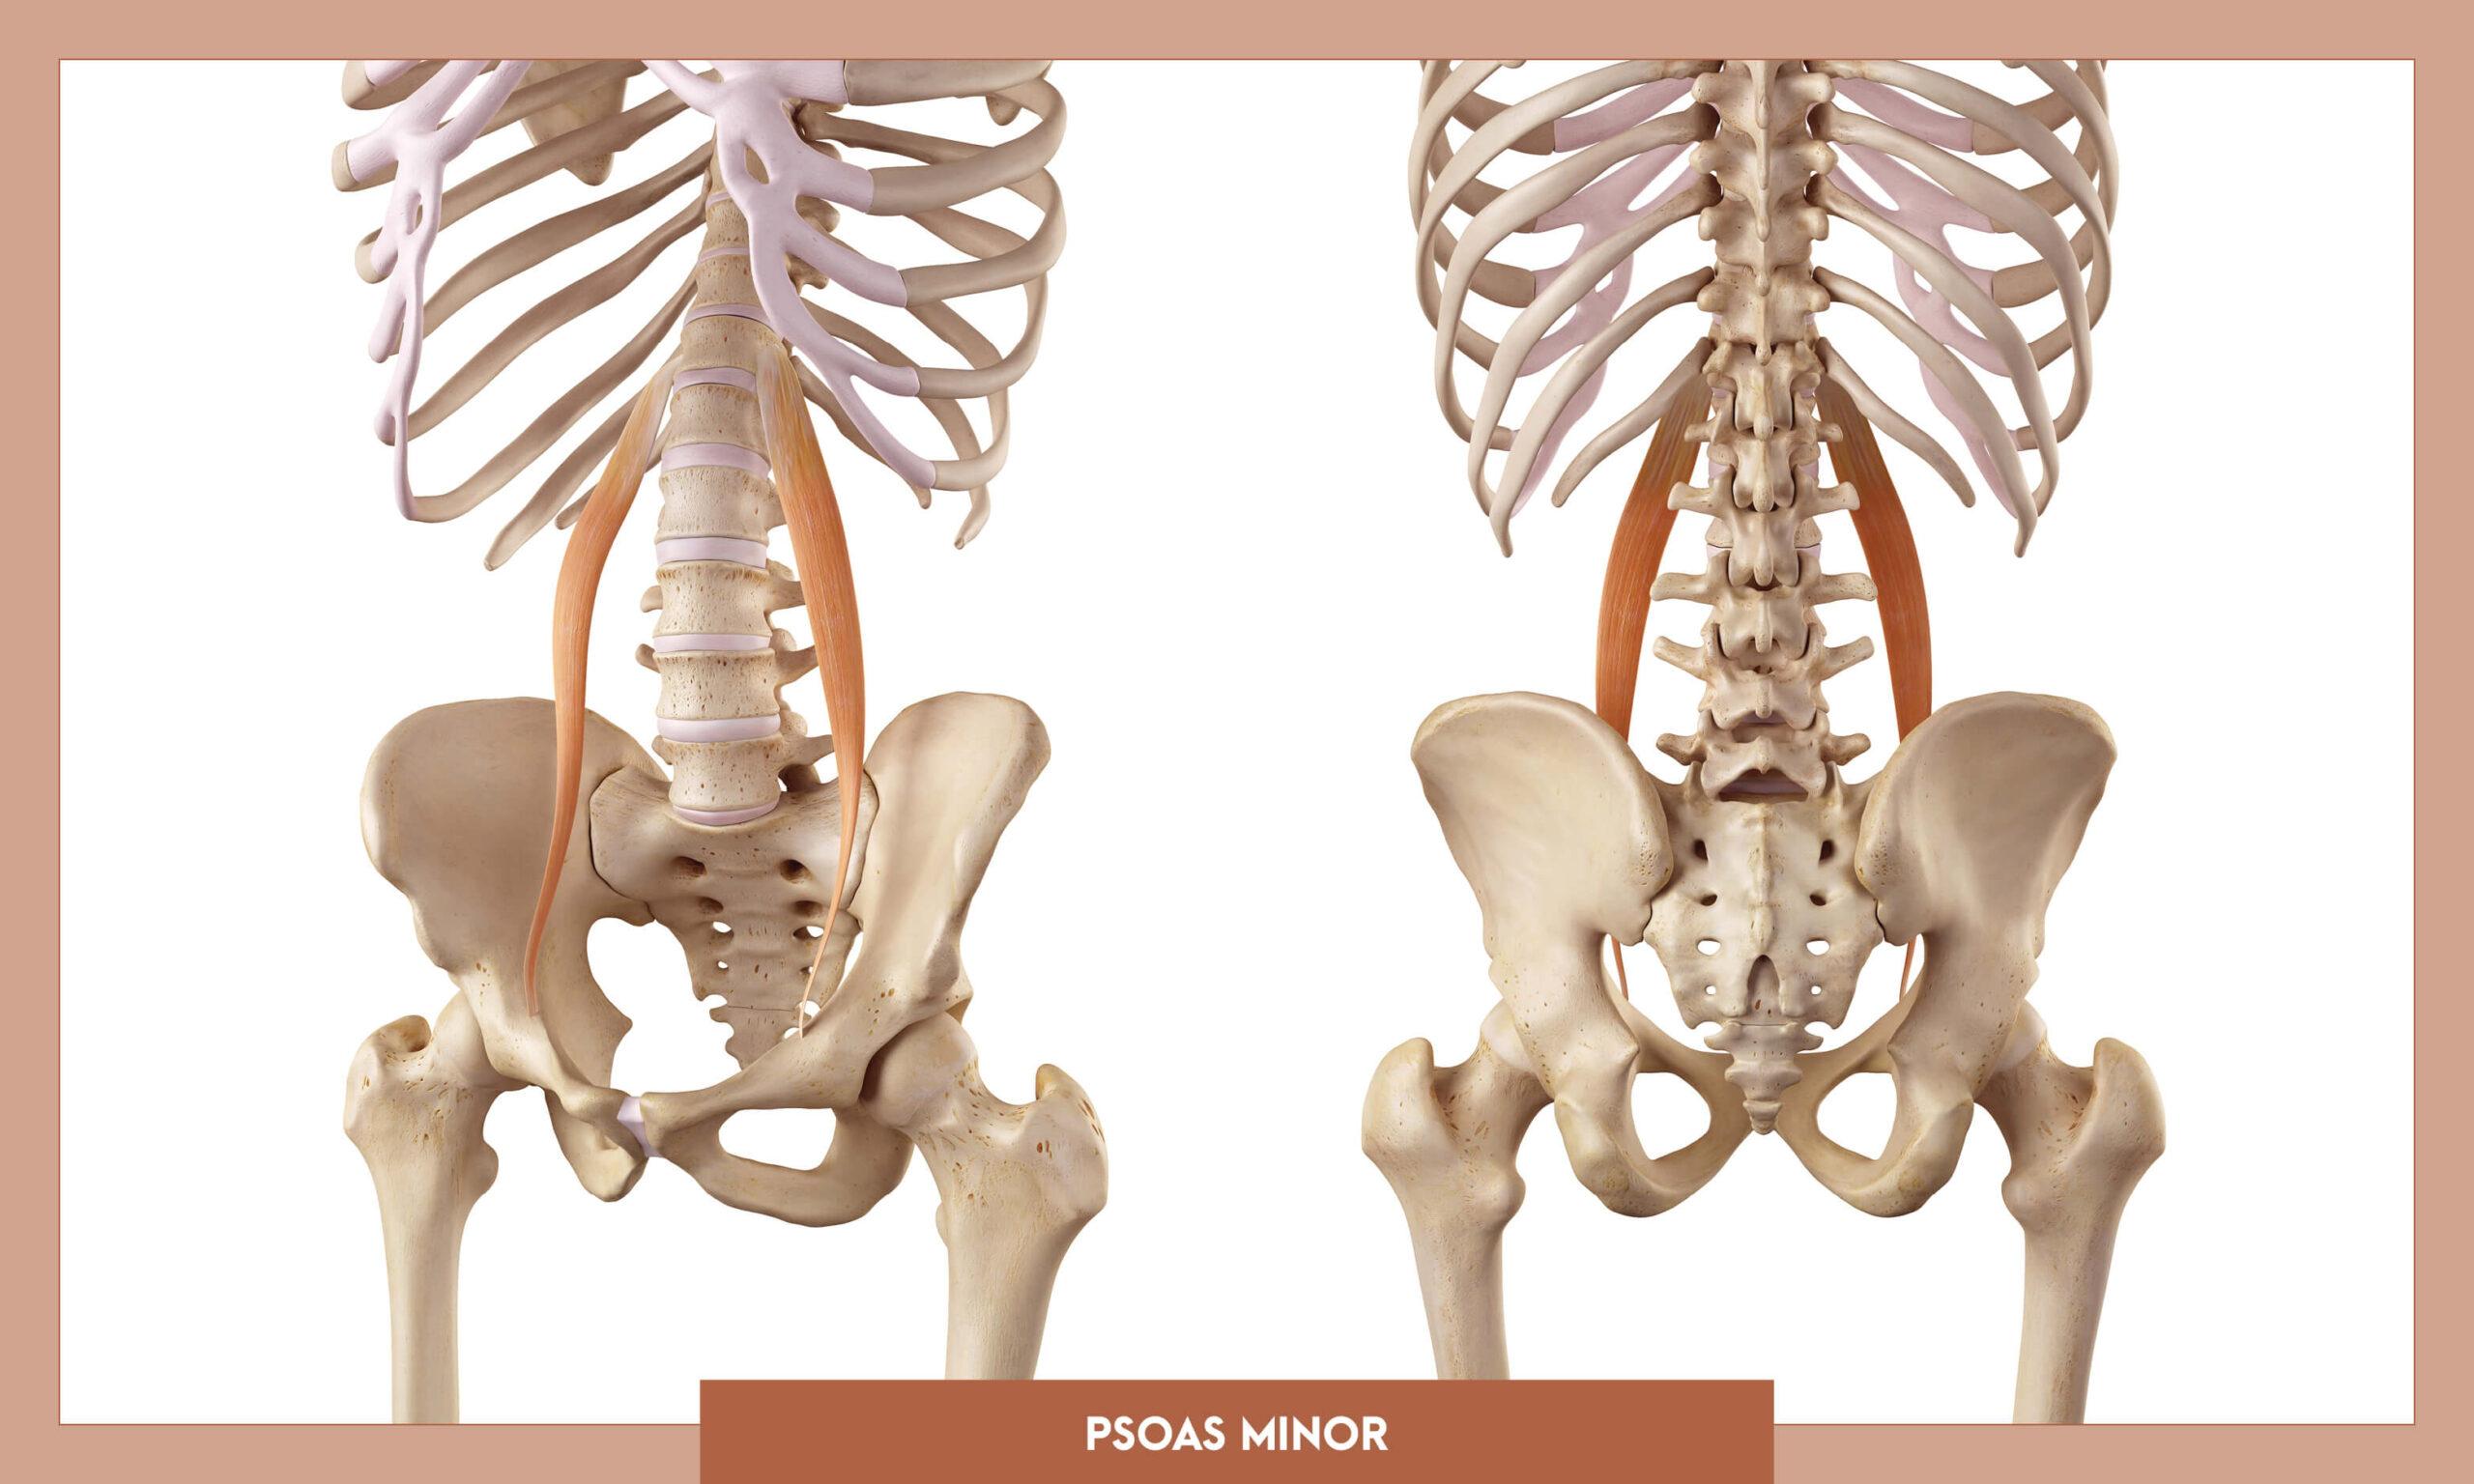 Muscles of thee Lower Limb - Psoas minor